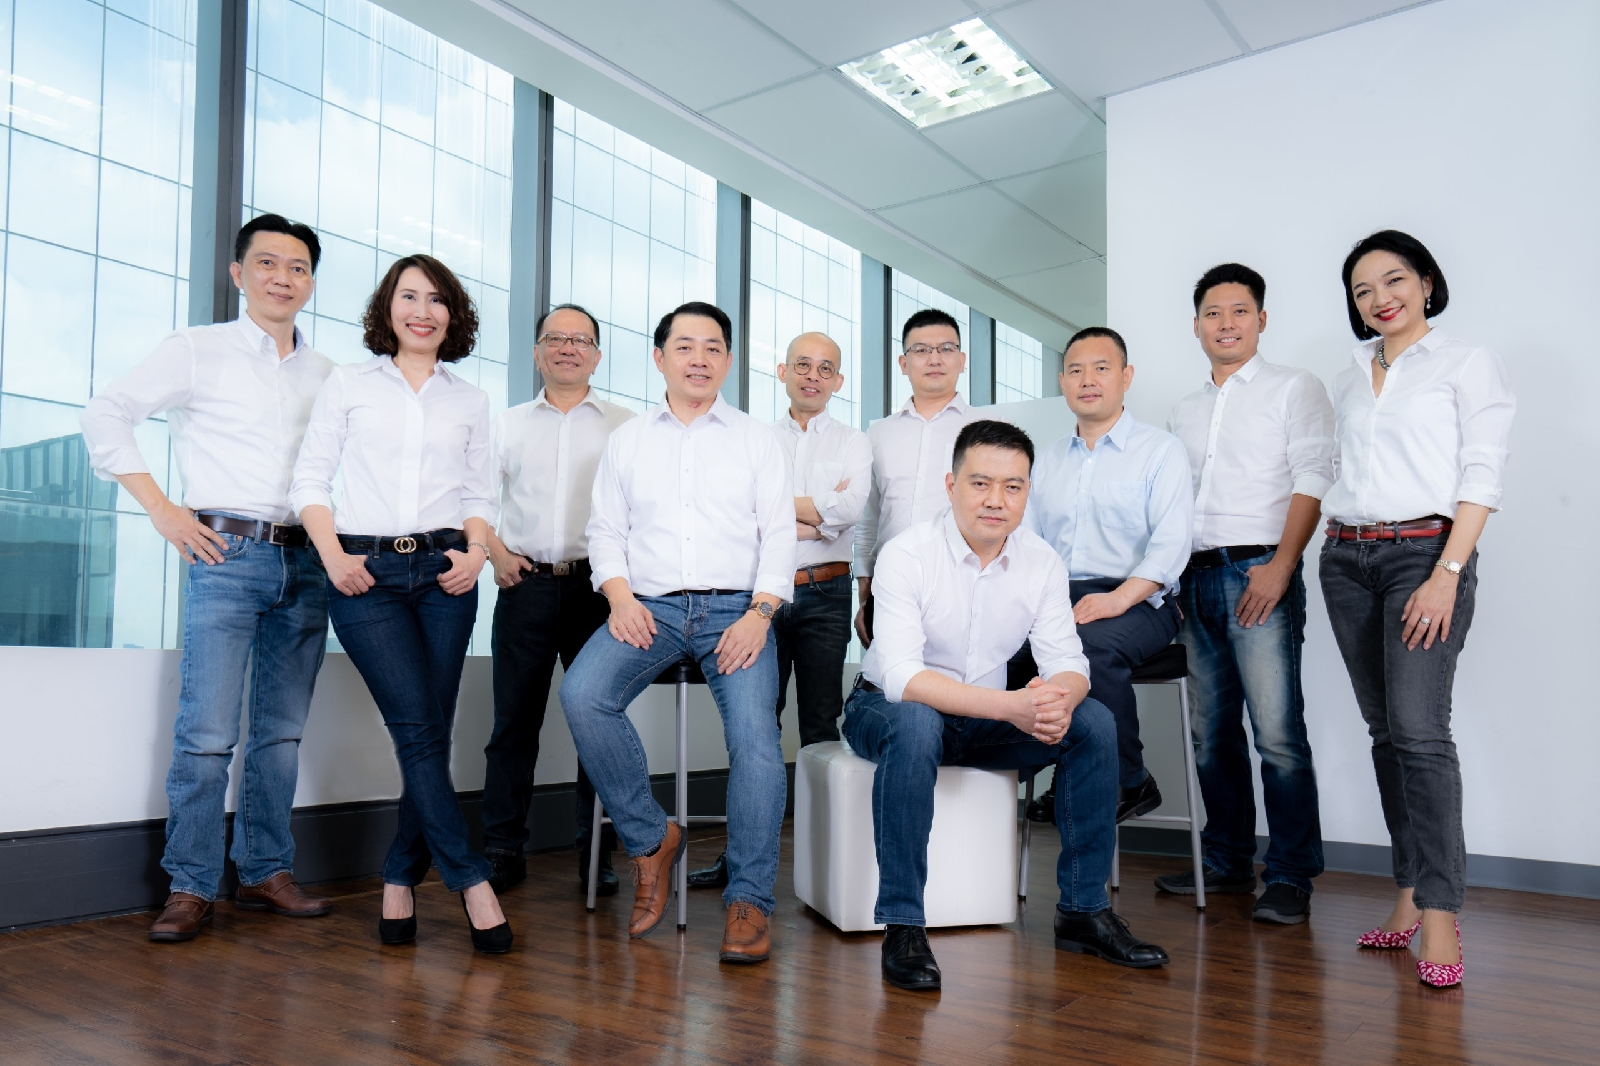 Great Wall Motors เปิดโผทัพผู้บริหารครบทีมพร้อมดันไทยขึ้นแท่นตลาดยุทธศาสตร์ ขยายความยิ่งใหญ่สู่เอเชียตะวันออกเฉียงใต้